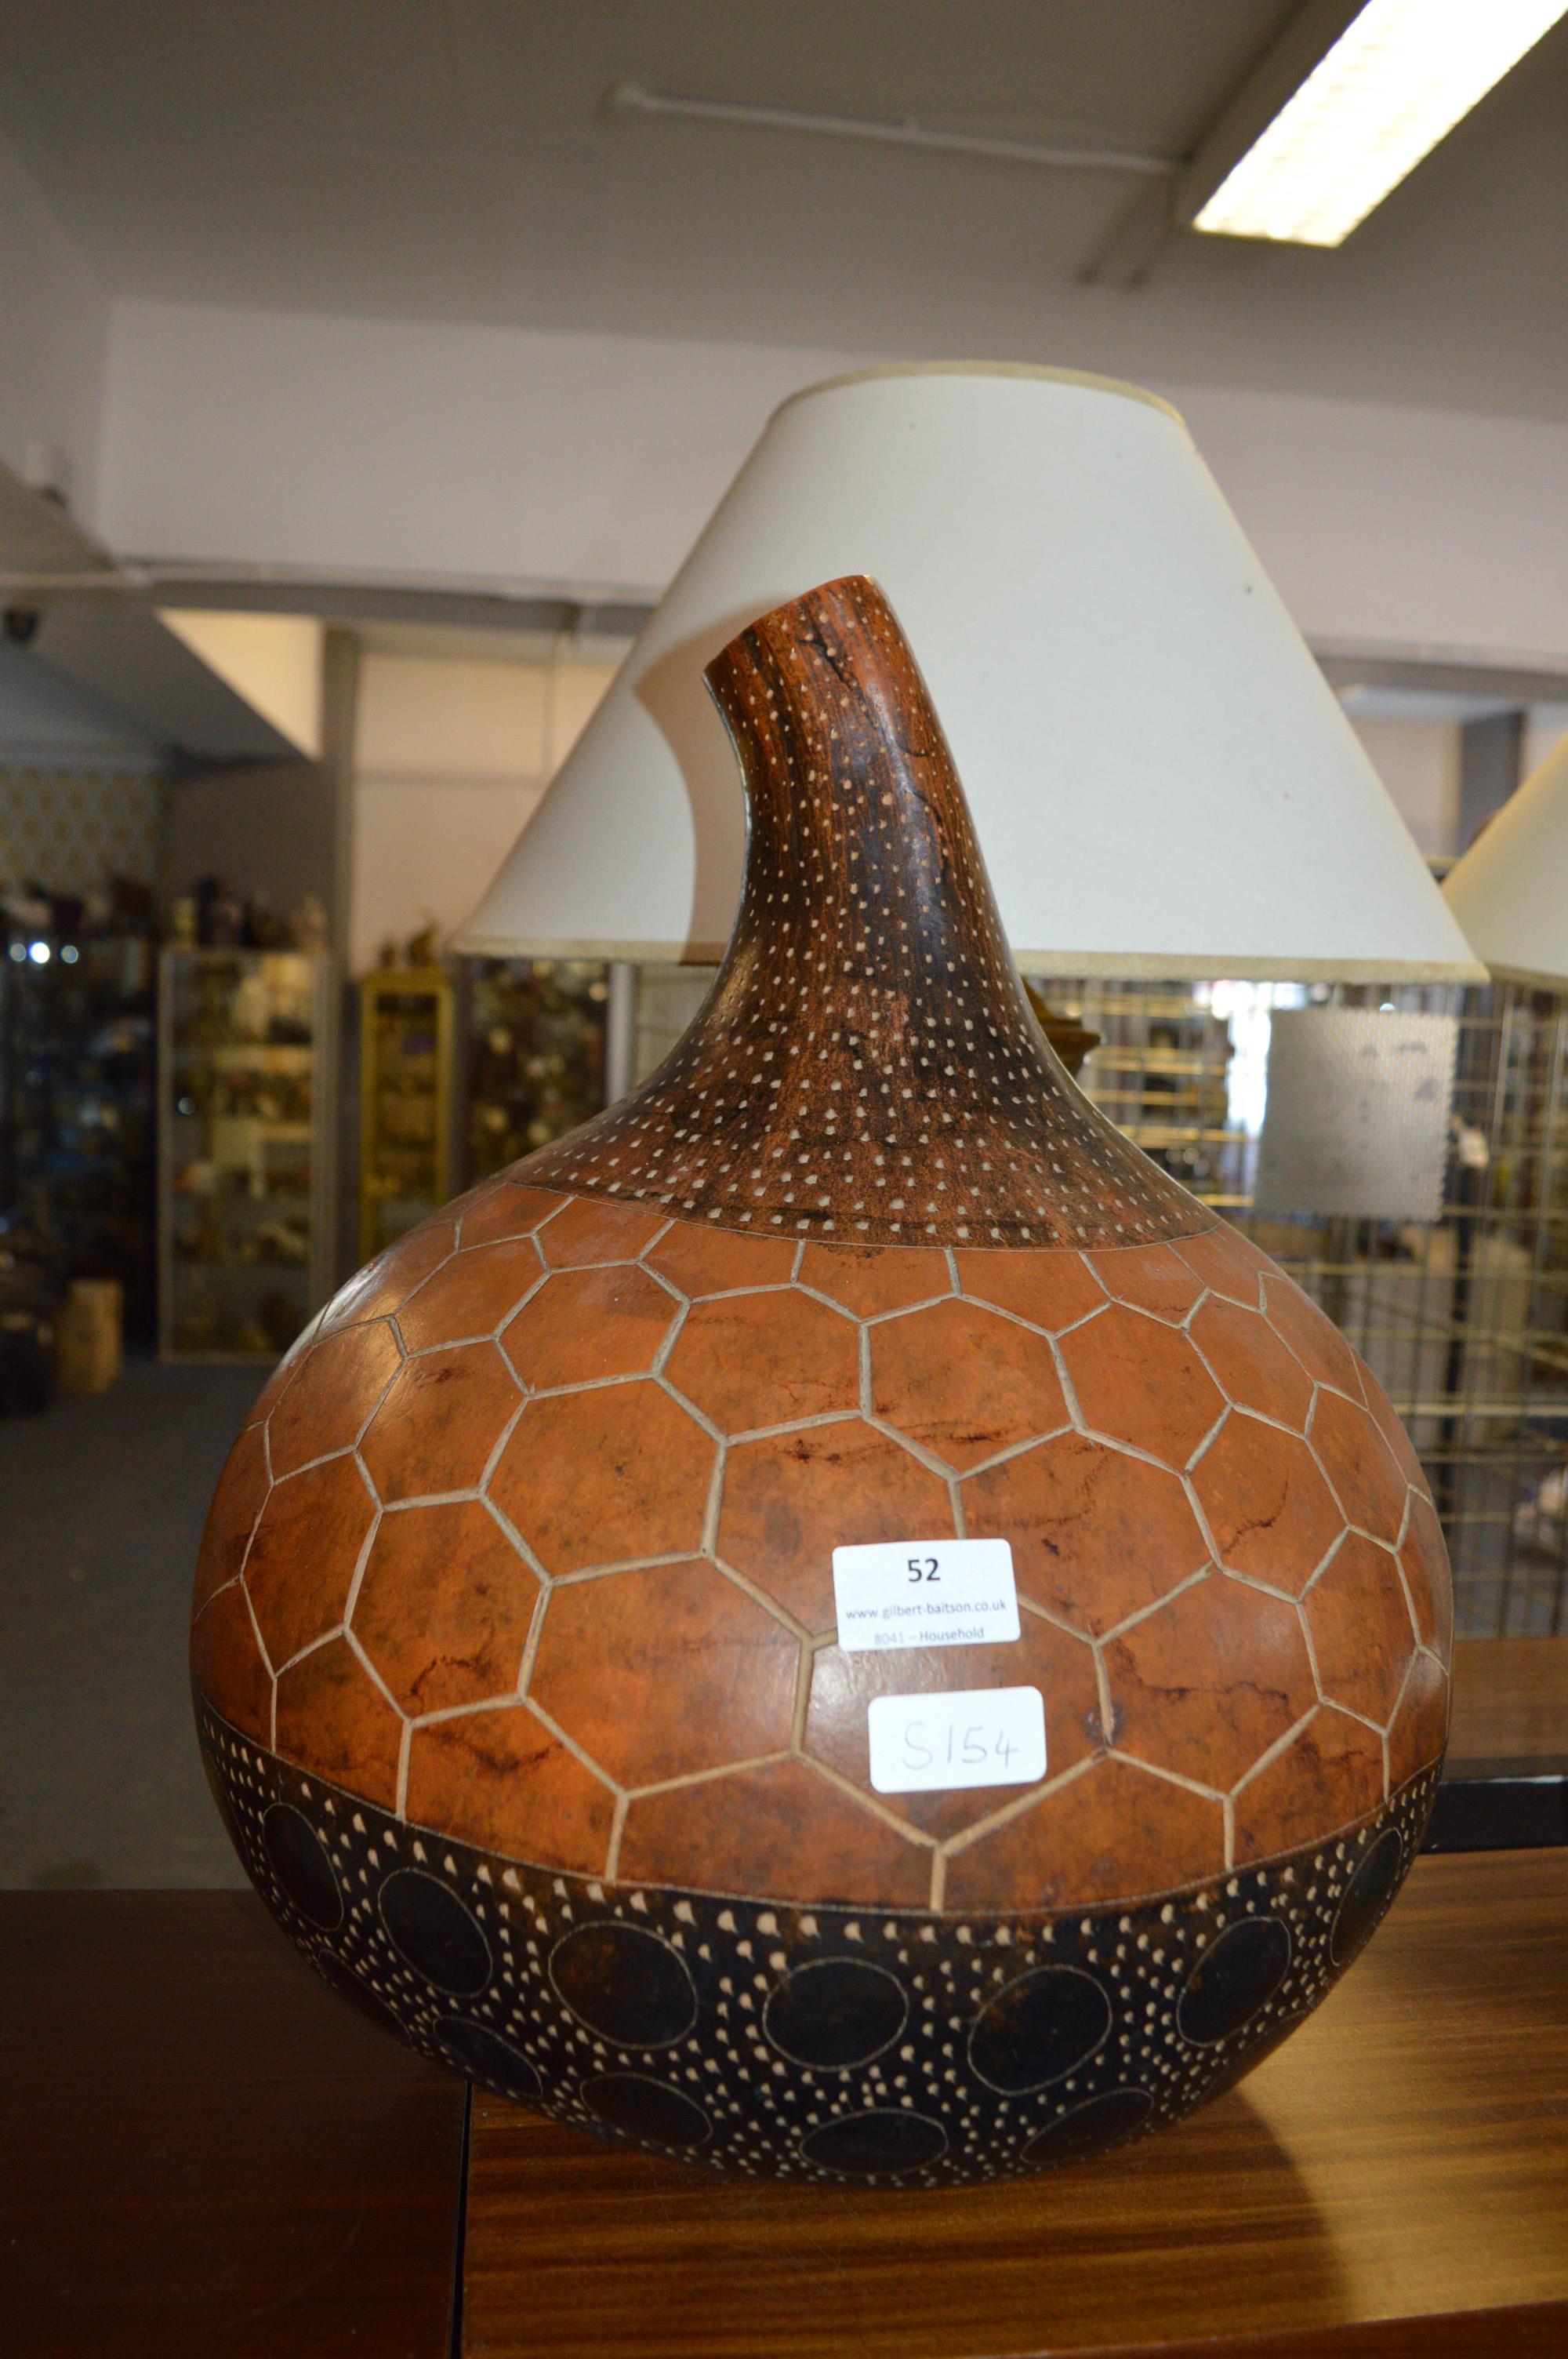 Lot 52 - Decorative Gourd